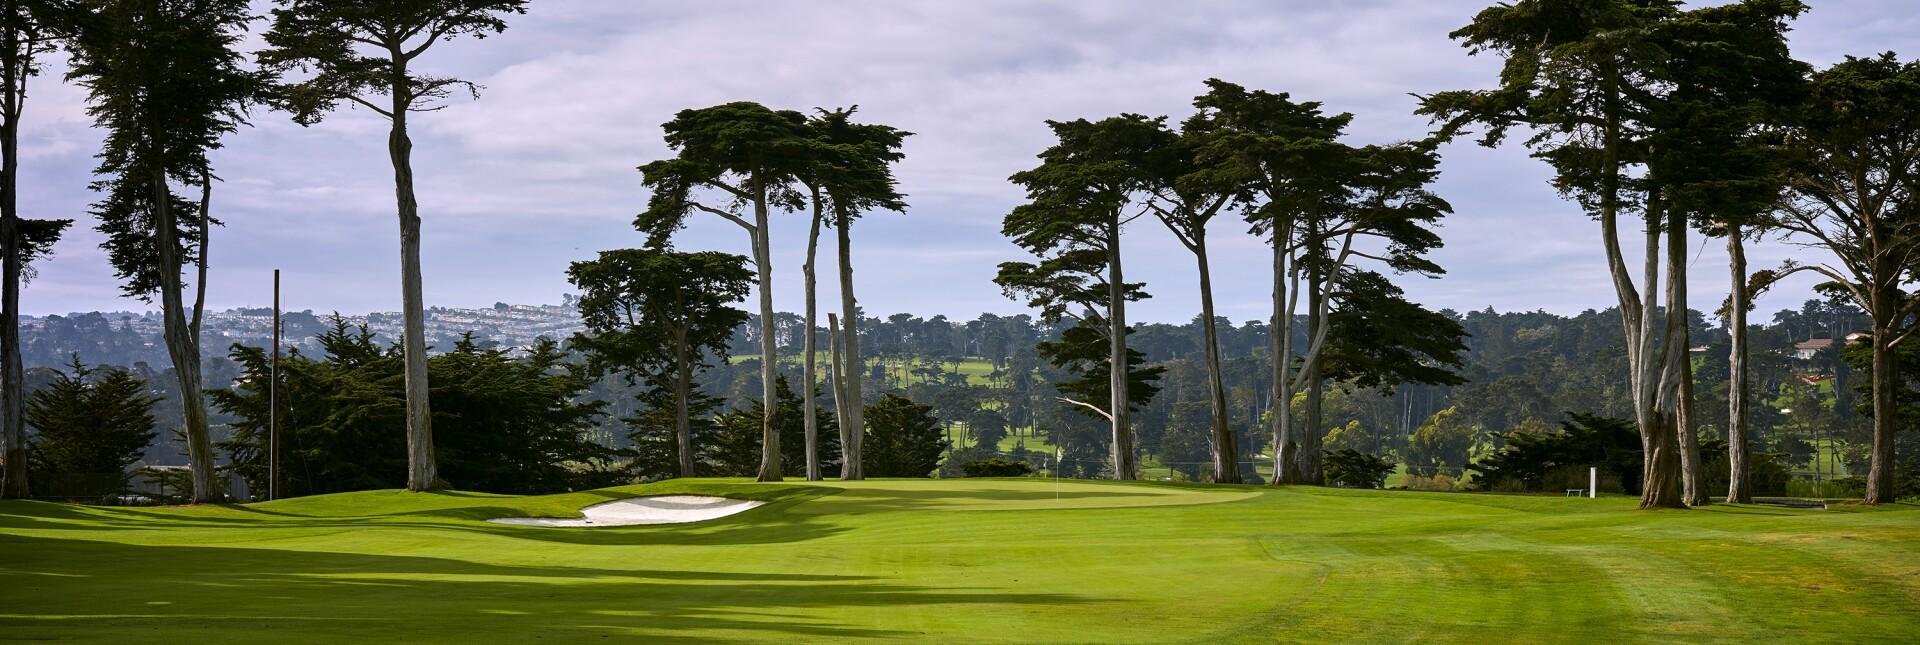 102nd PGA Championship